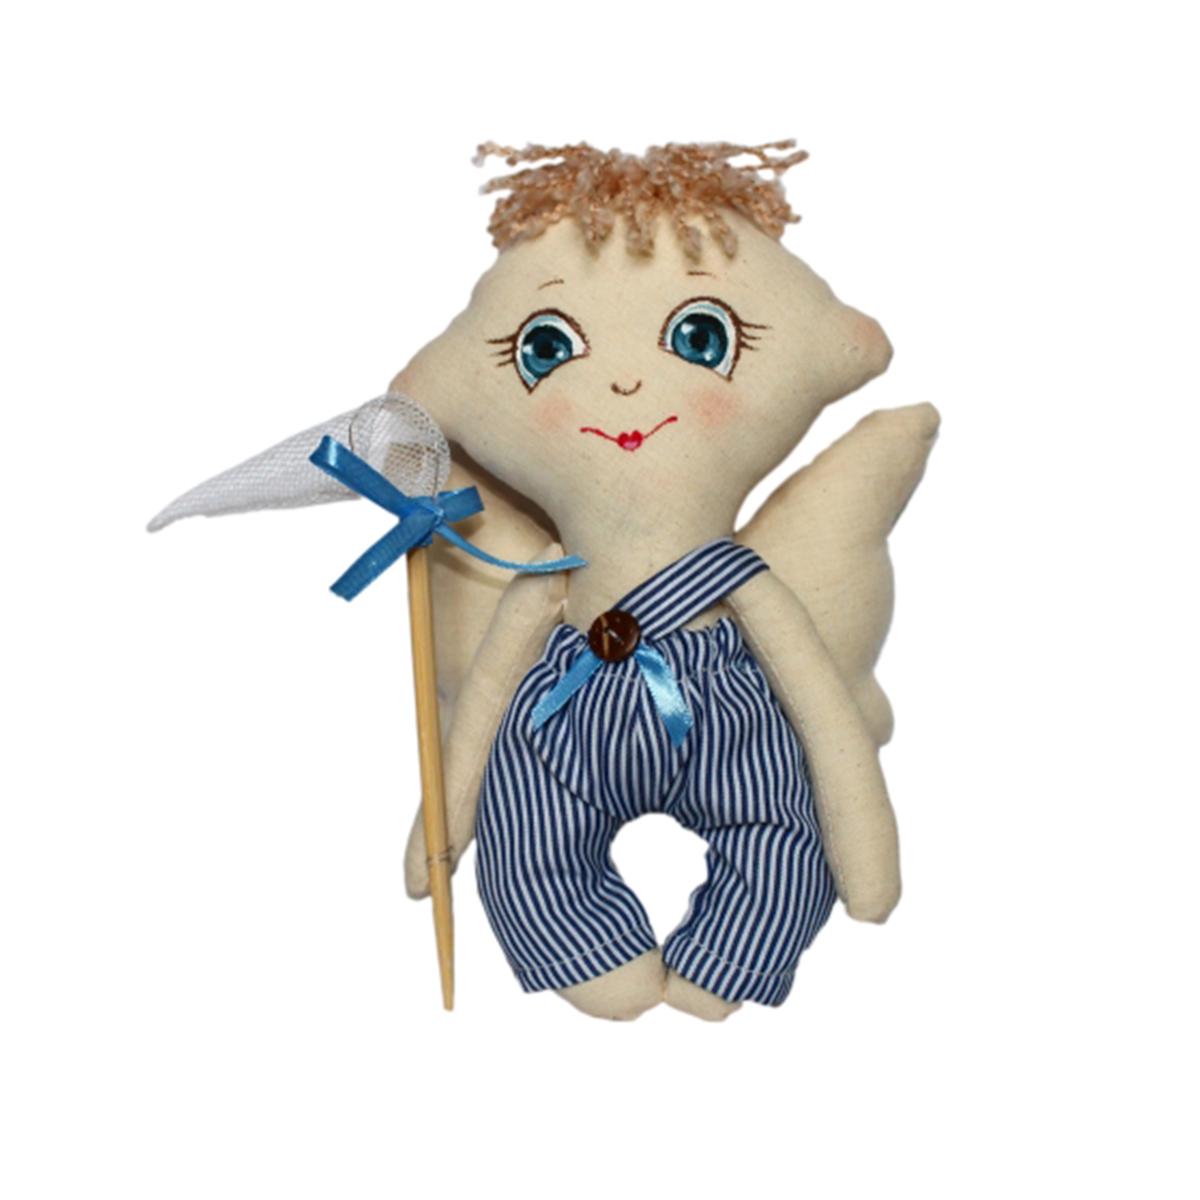 Набор для изготовления игрушки Артмикс Сережка, высота 22 см. AM100013 набор для изготовления текстильной игрушки артмикс мишка папа высота 25 см